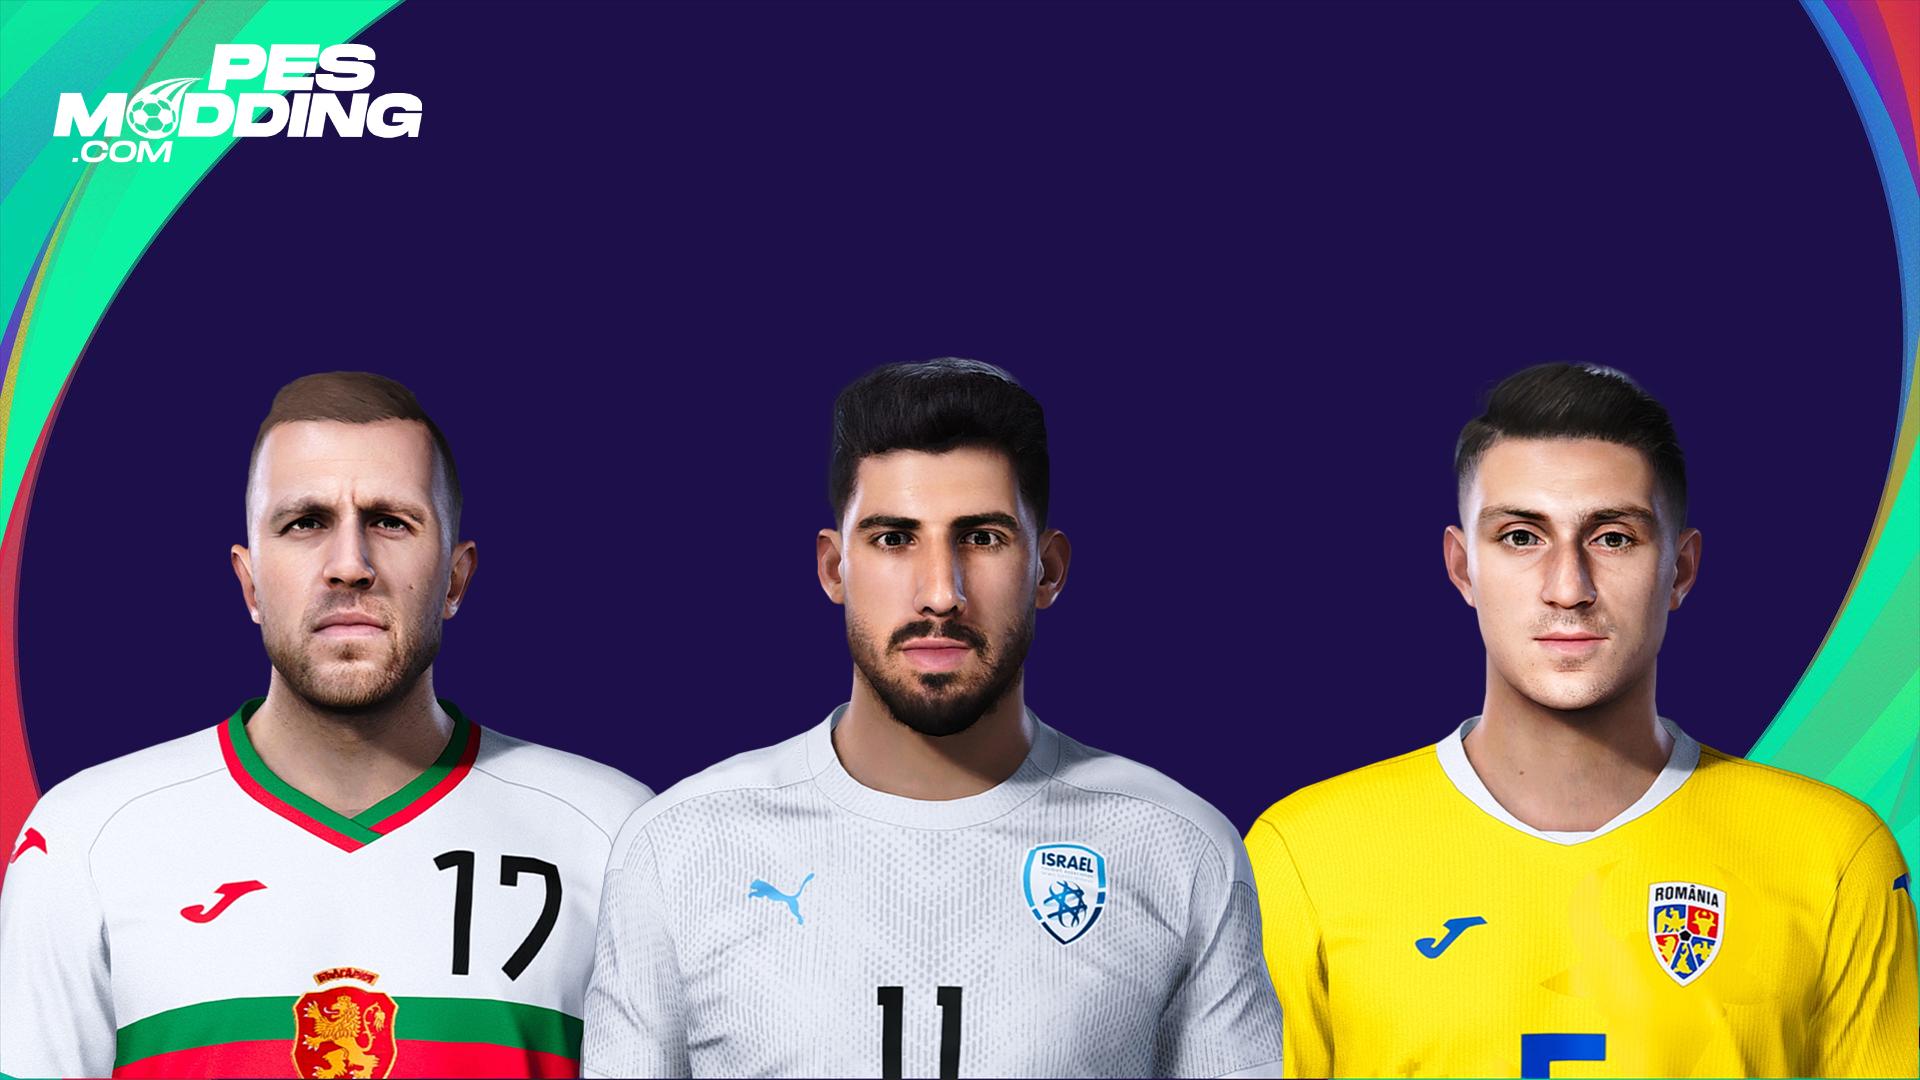 PES 2021 Faces - I. Nedelcearu + Y. Cohen + A. Iliev